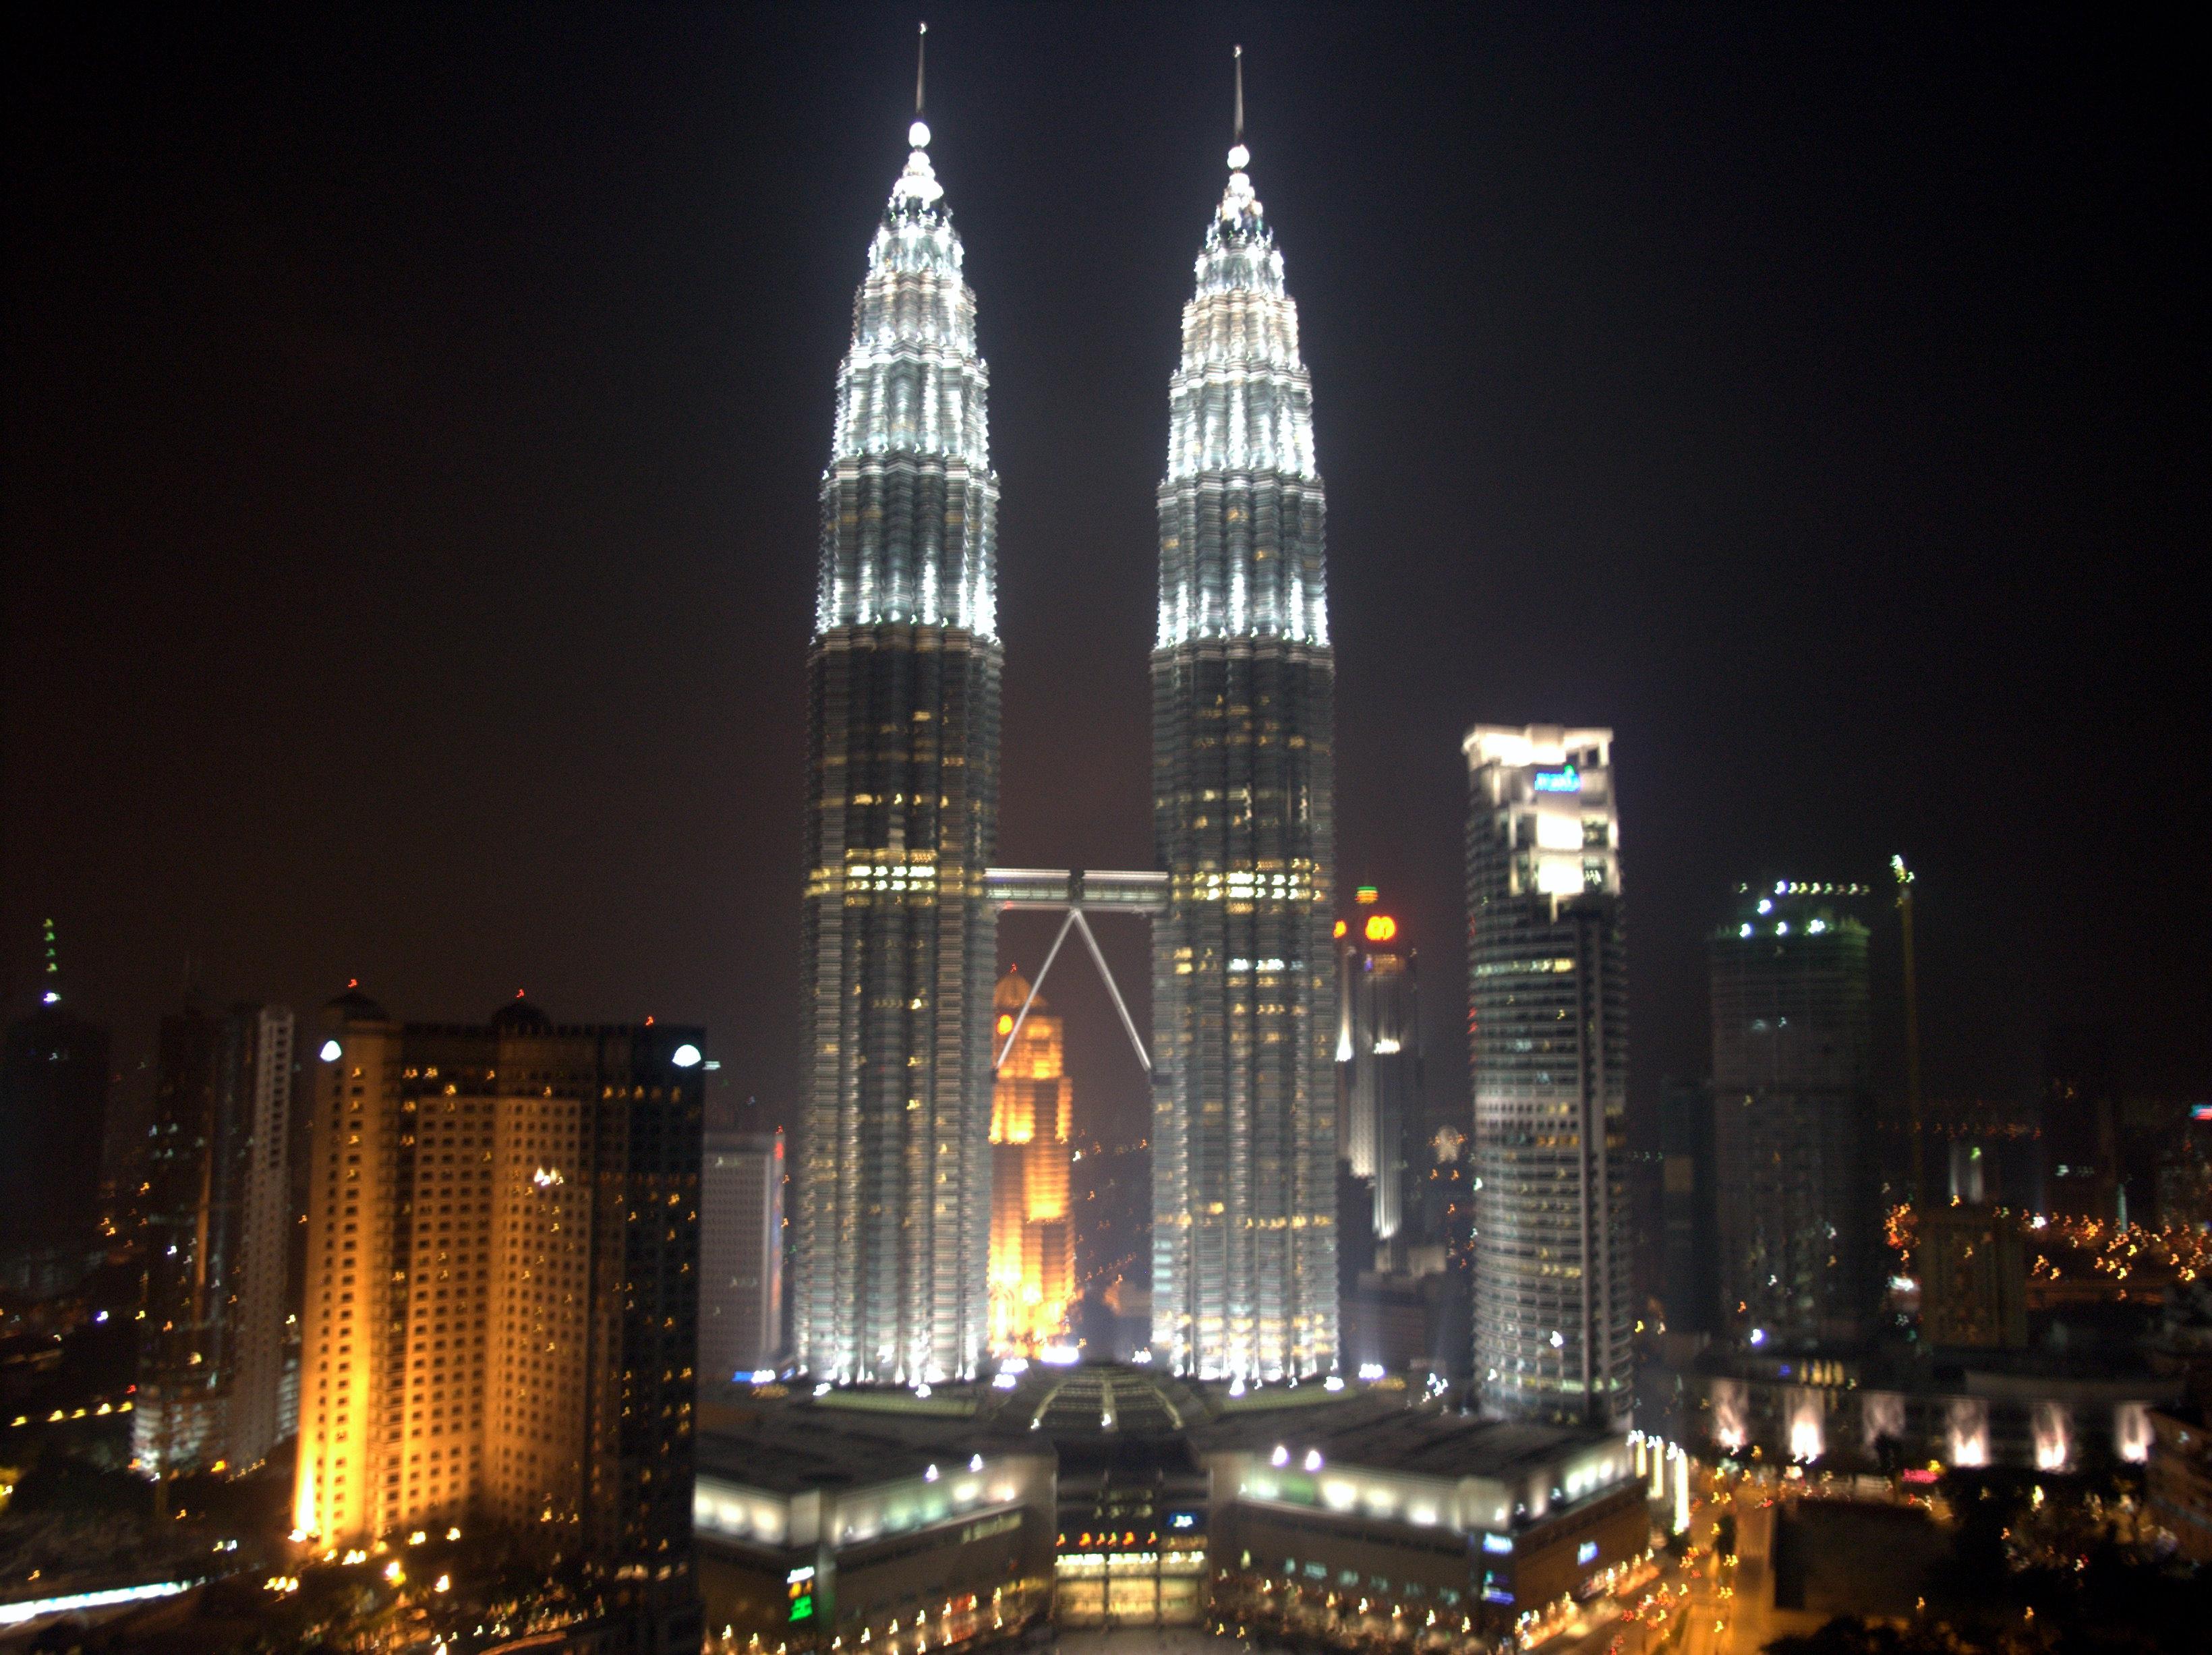 Exotic Petronas Towers At Night - Exotic Petronas Towers At Night